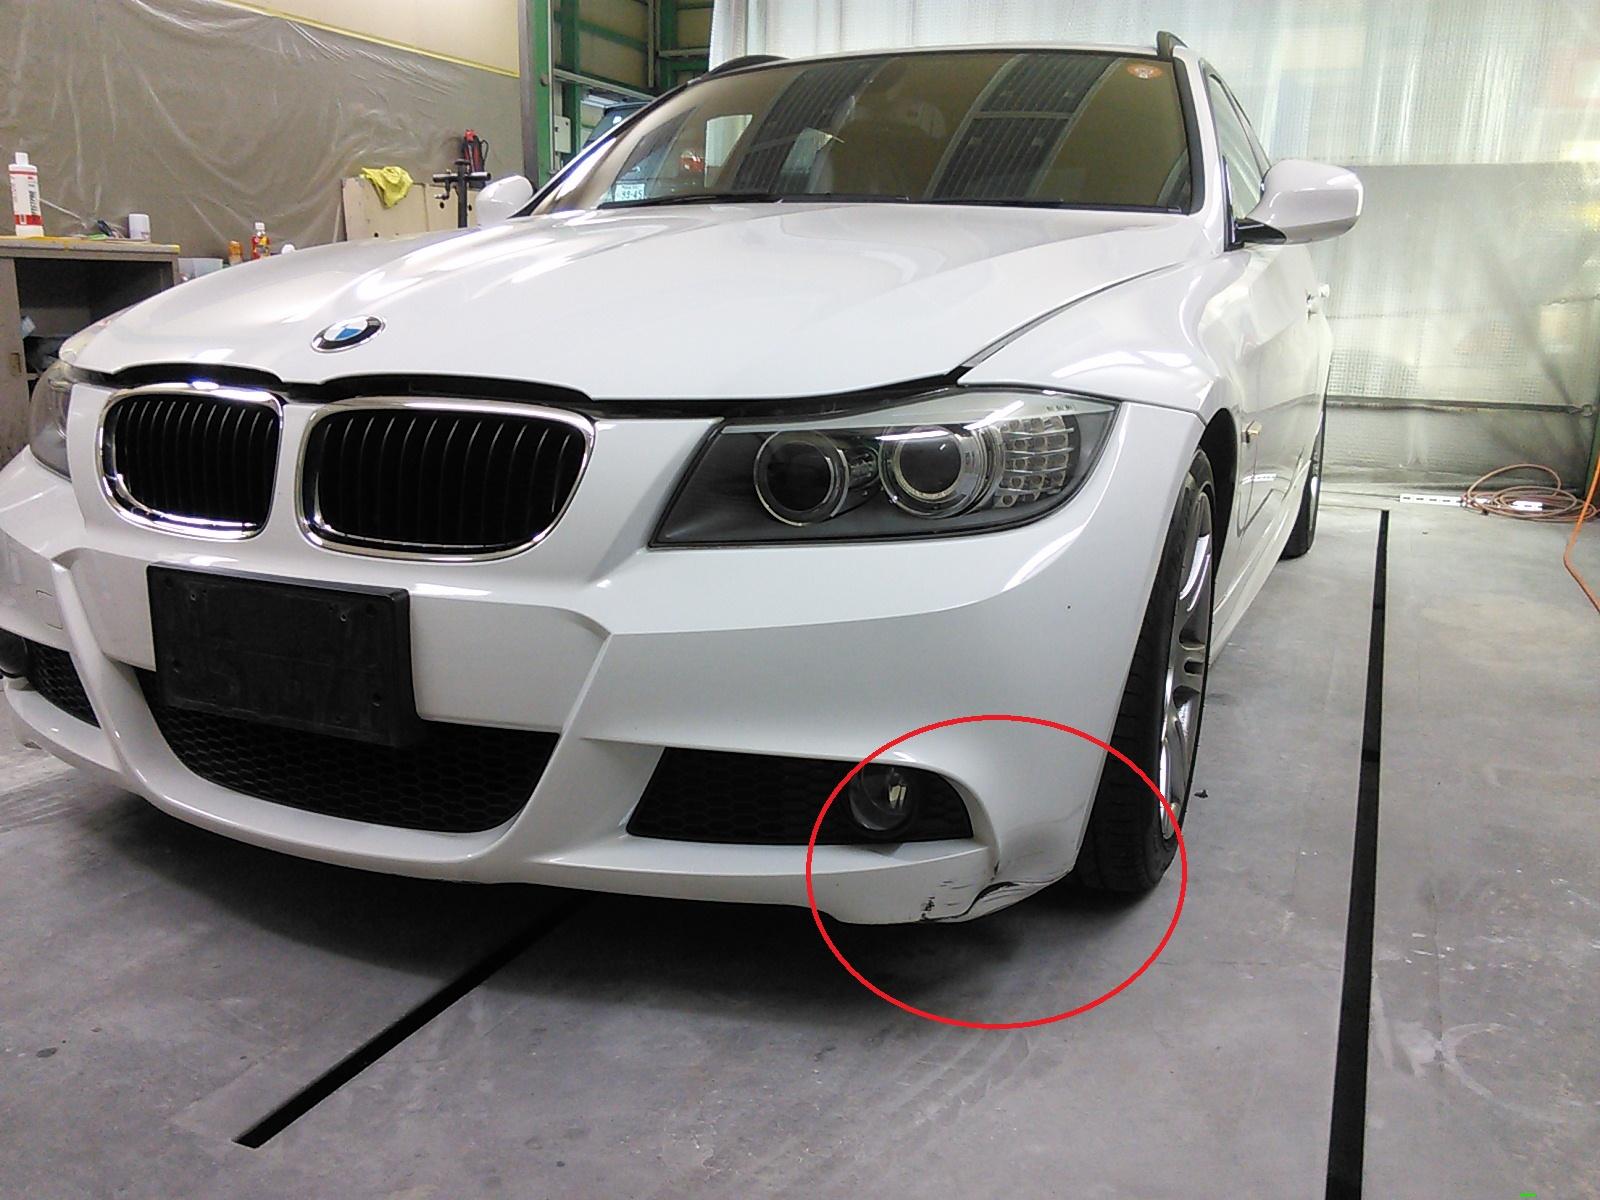 BMW フロントバンパー へこみ修理   豊田市  板金塗装